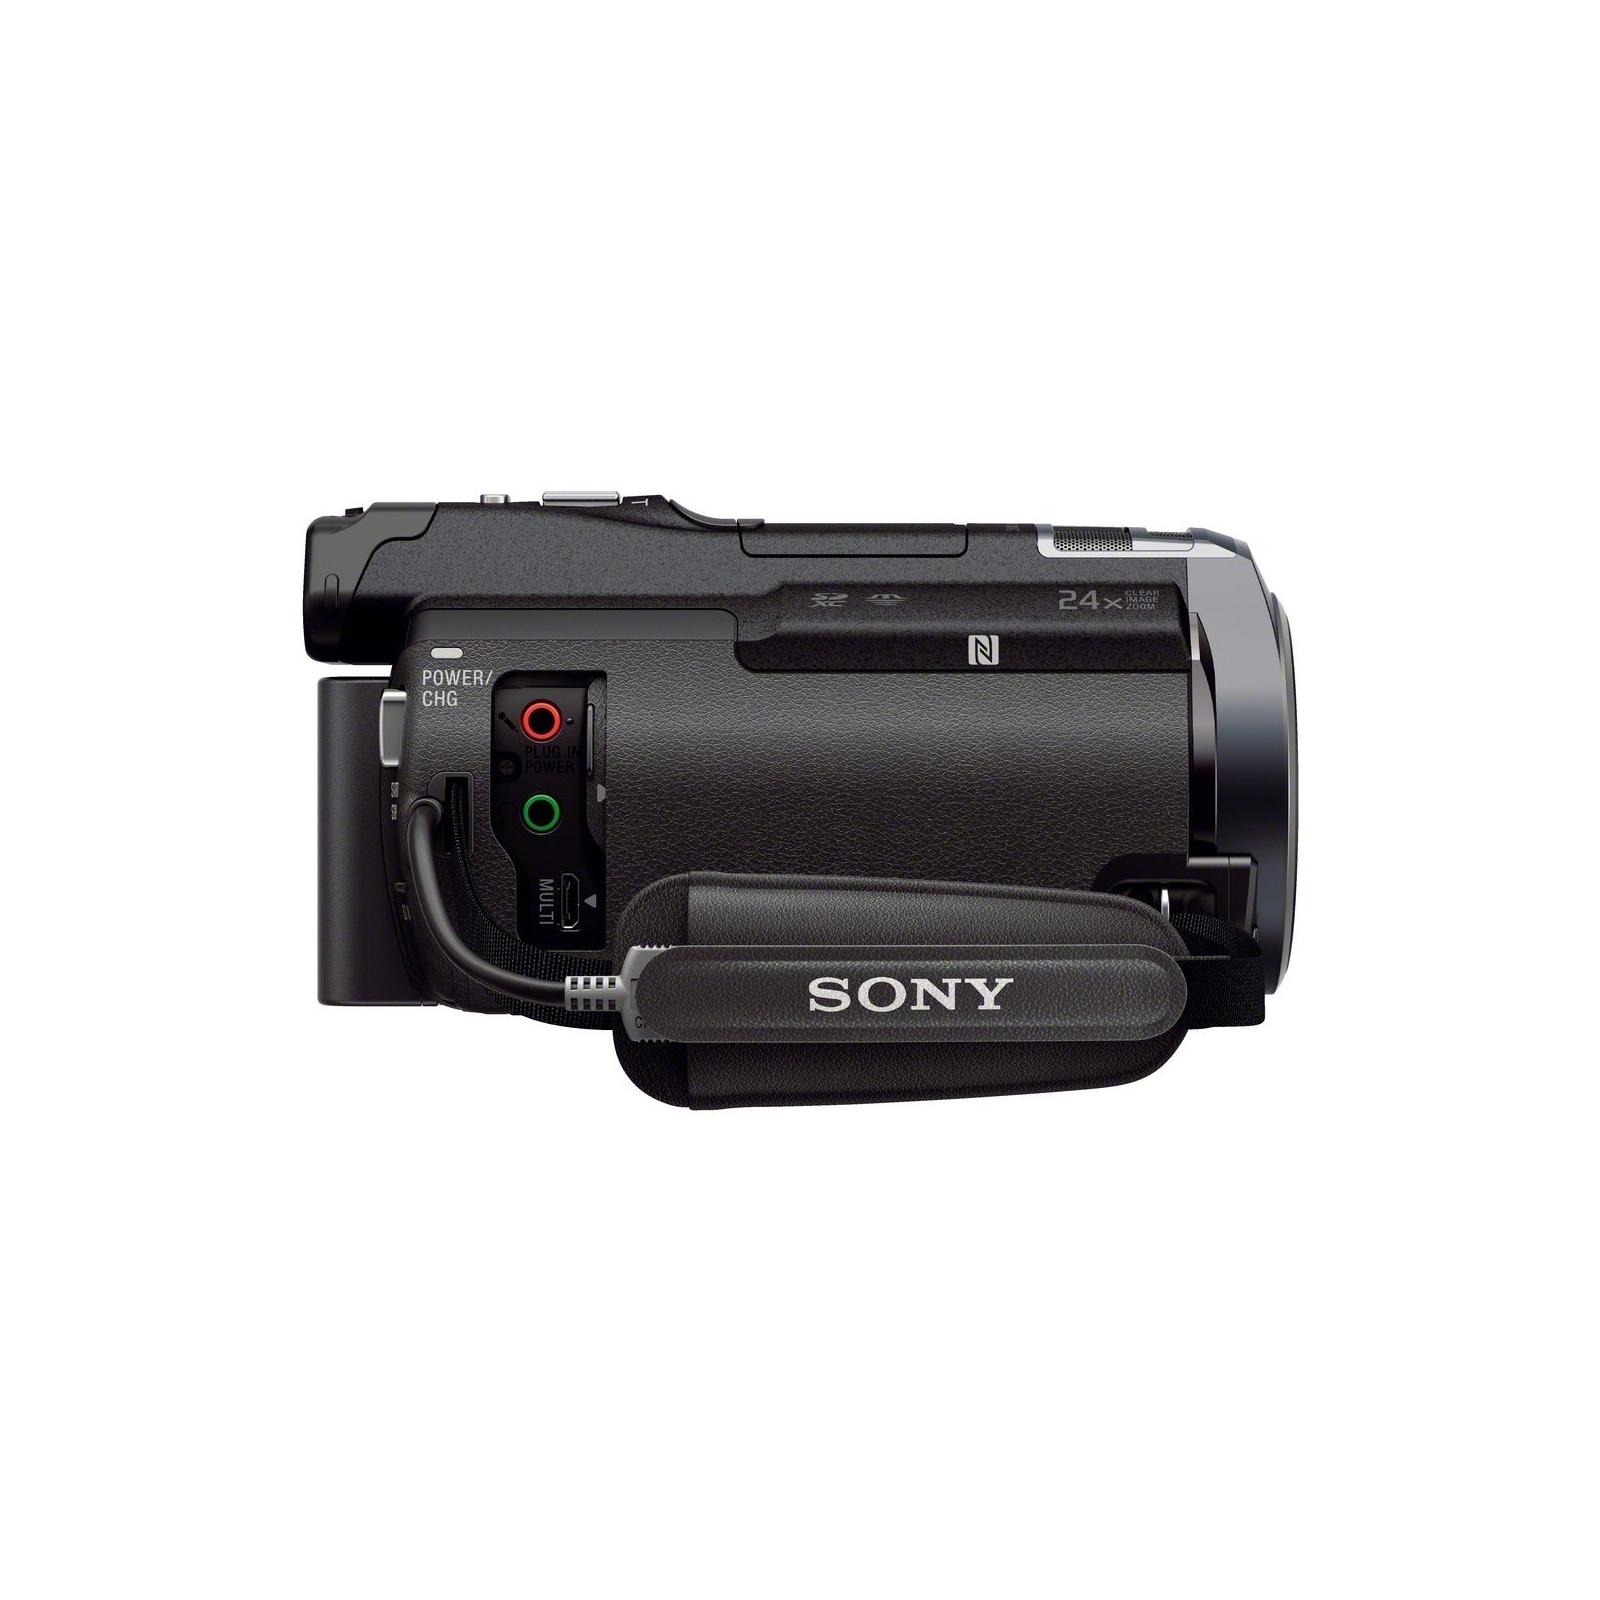 Цифровая видеокамера SONY Handycam HDR-PJ810 Black (HDRPJ810EB.CEL) изображение 6